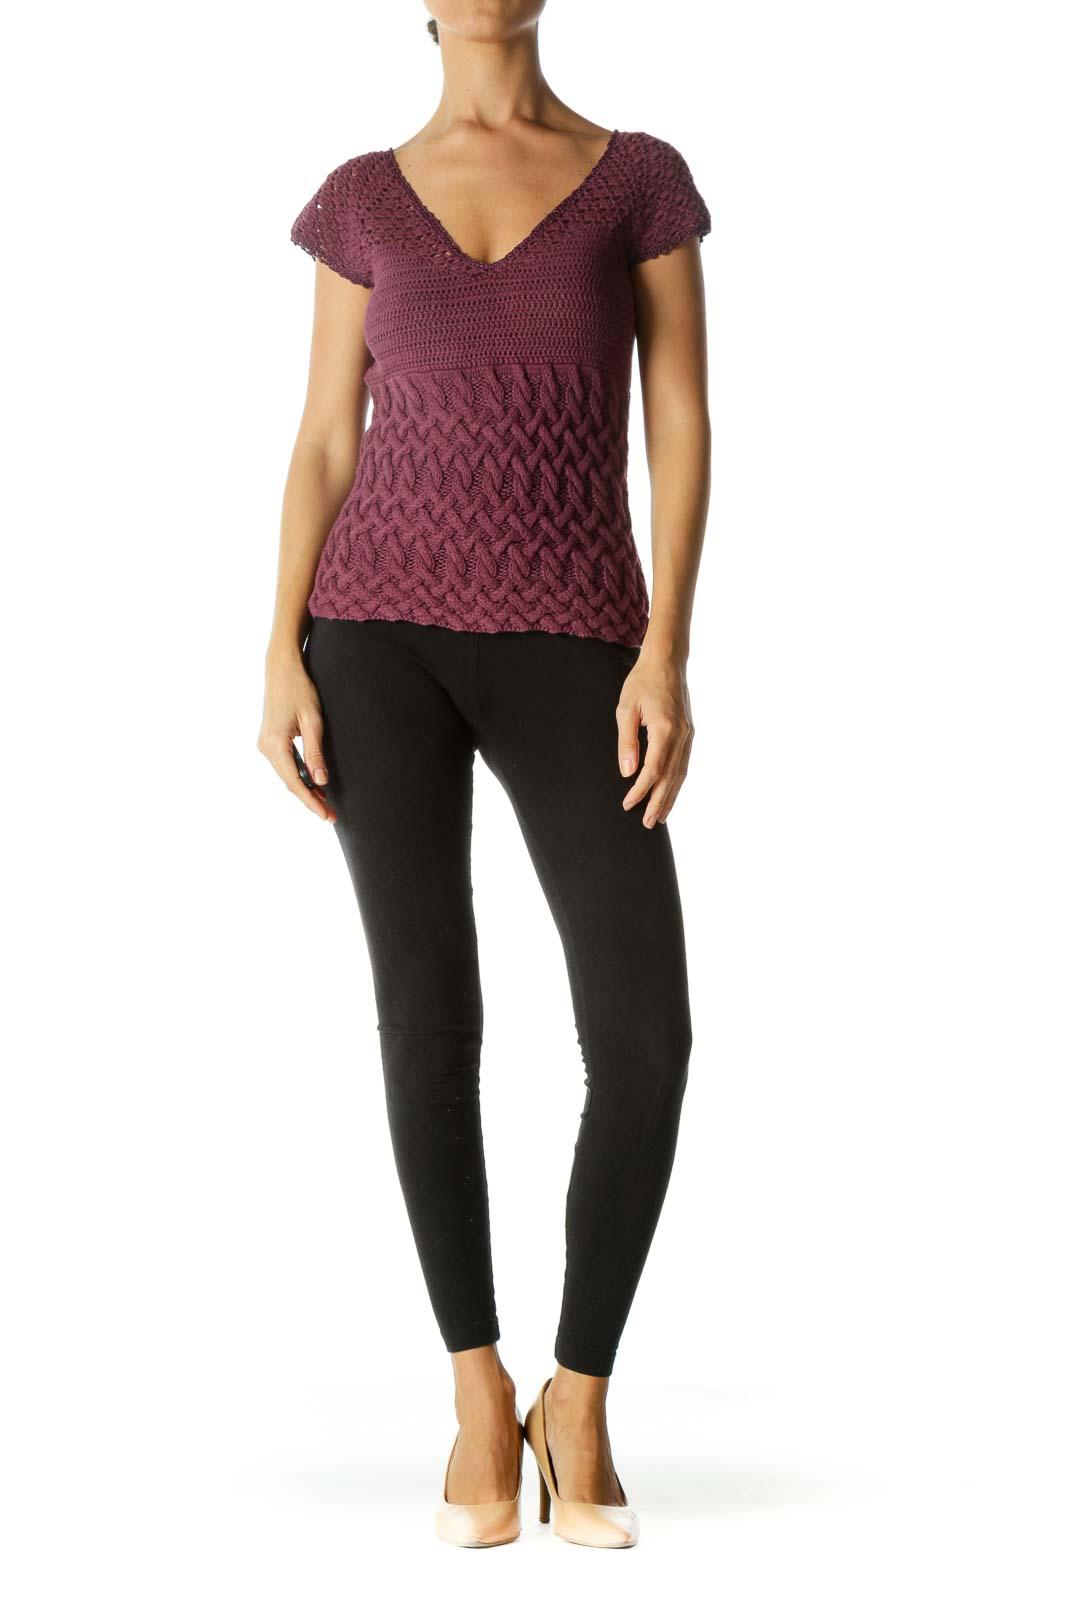 Purple V-Neck Lace Trim Detail Varying Knit Patterns Top